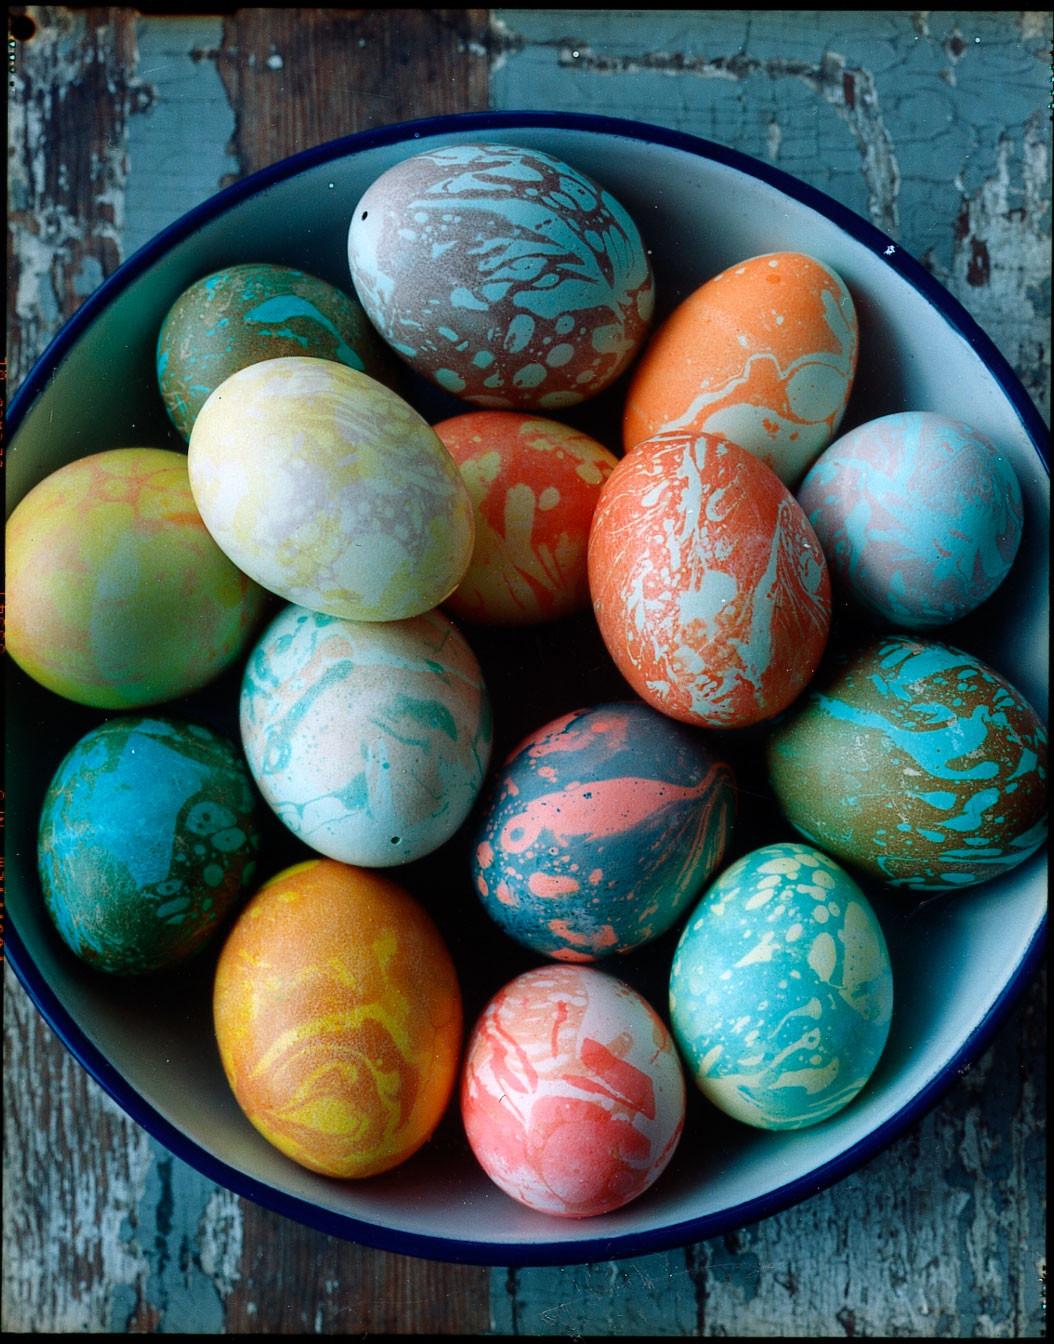 Easter Party Ideas Martha Stewart  Easter Egg Decorating Ideas 3 Martha Stewart Methods